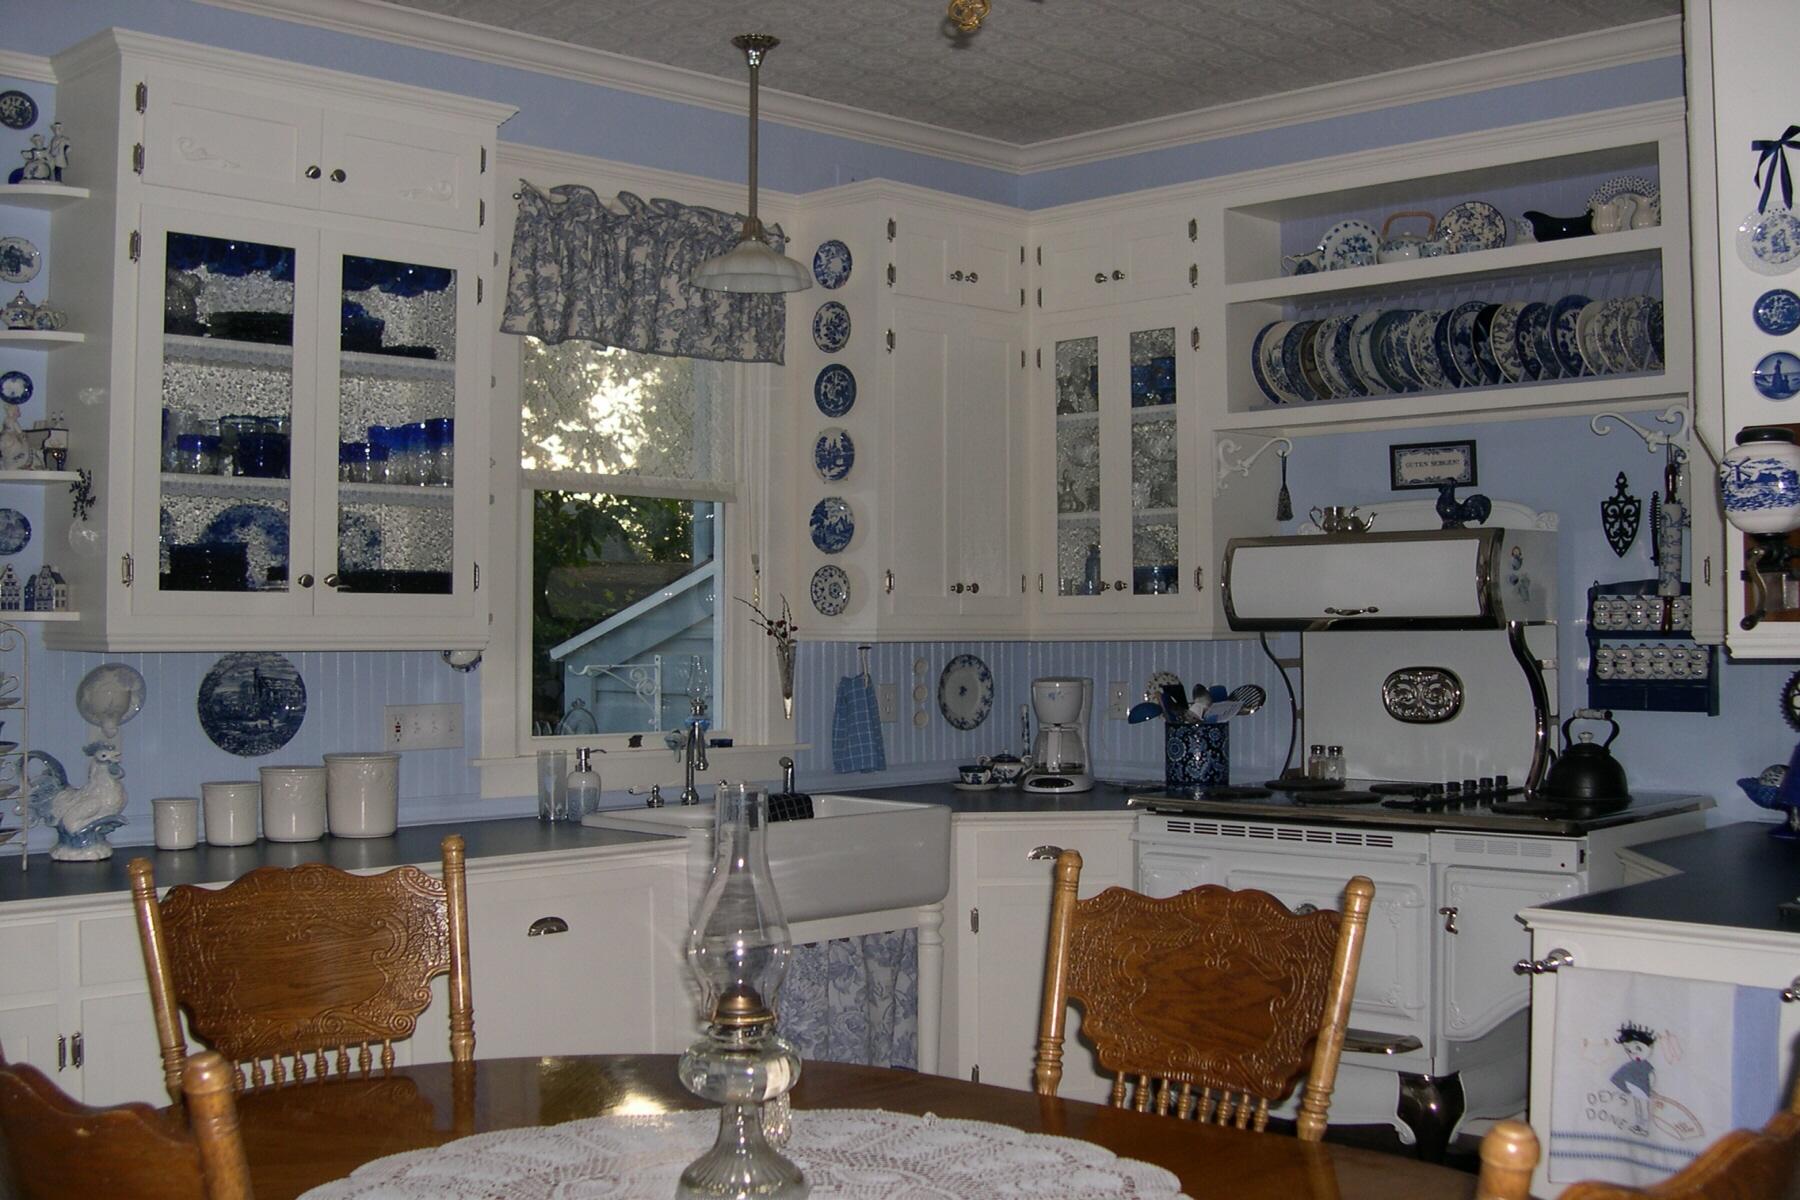 1000 images about victorian farmhouse mini on pinterest victorian dollhouse victorian on kitchen interior farmhouse id=87619